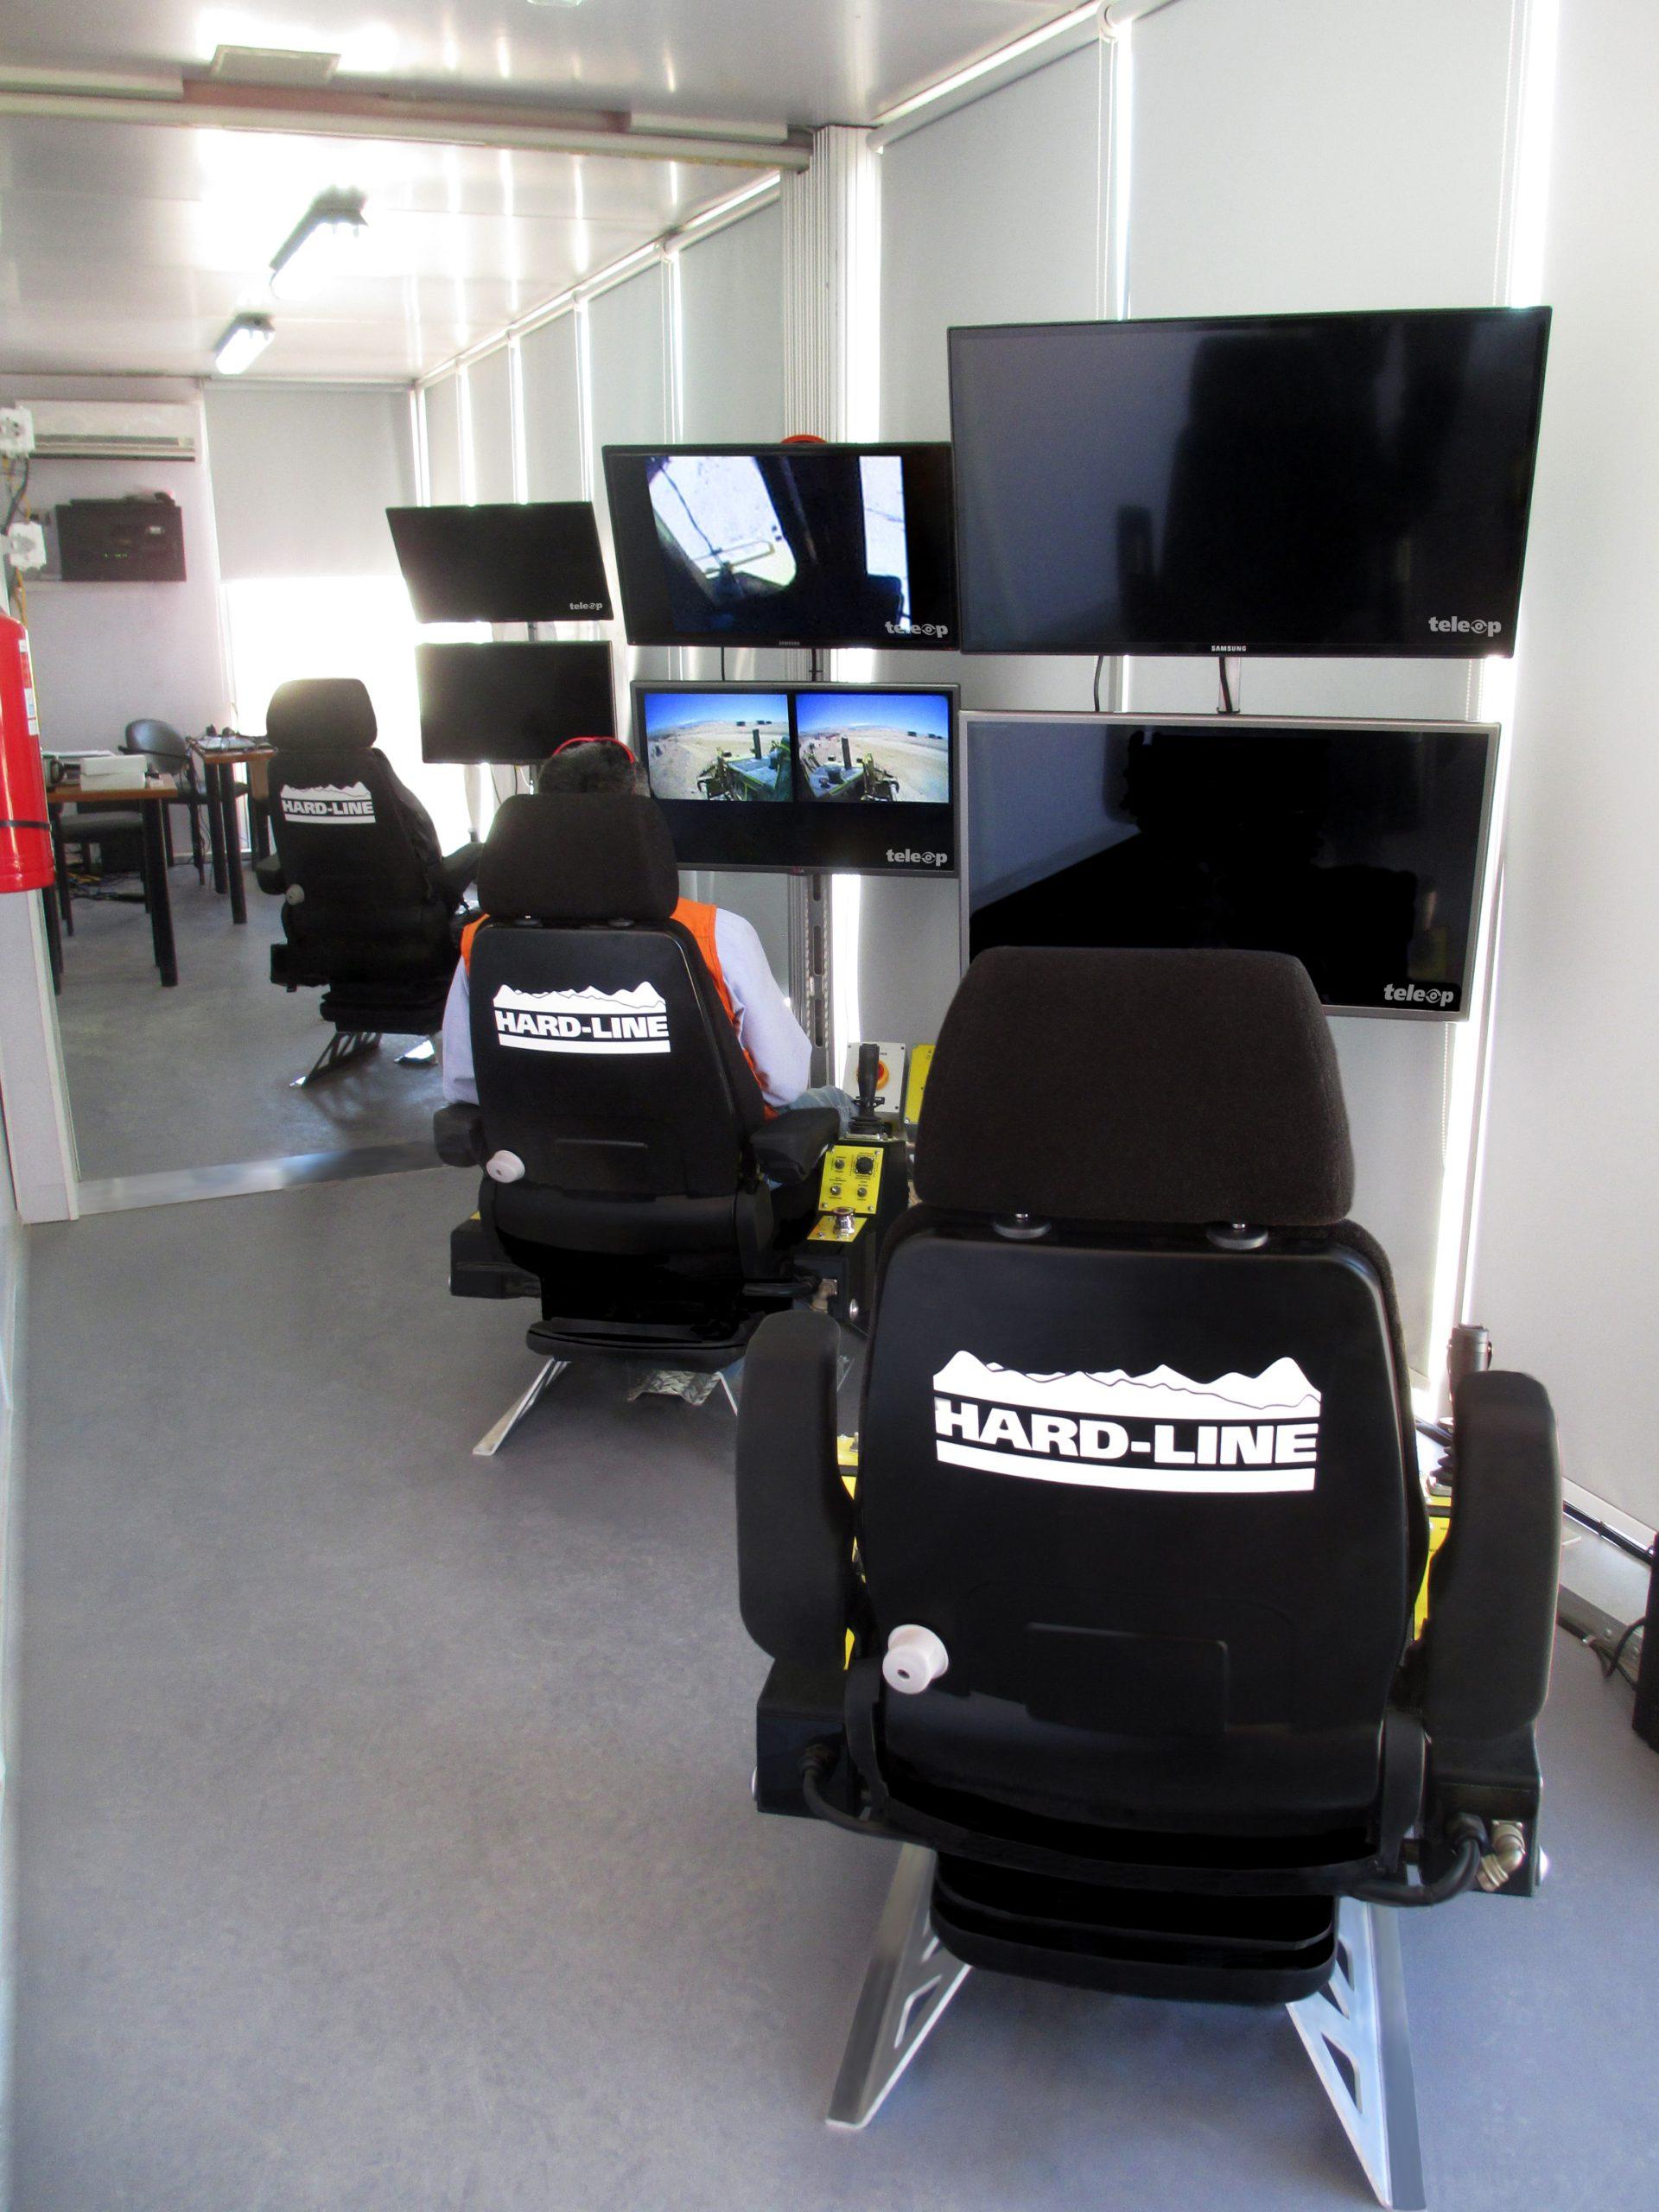 TeleOp Control Station Interior